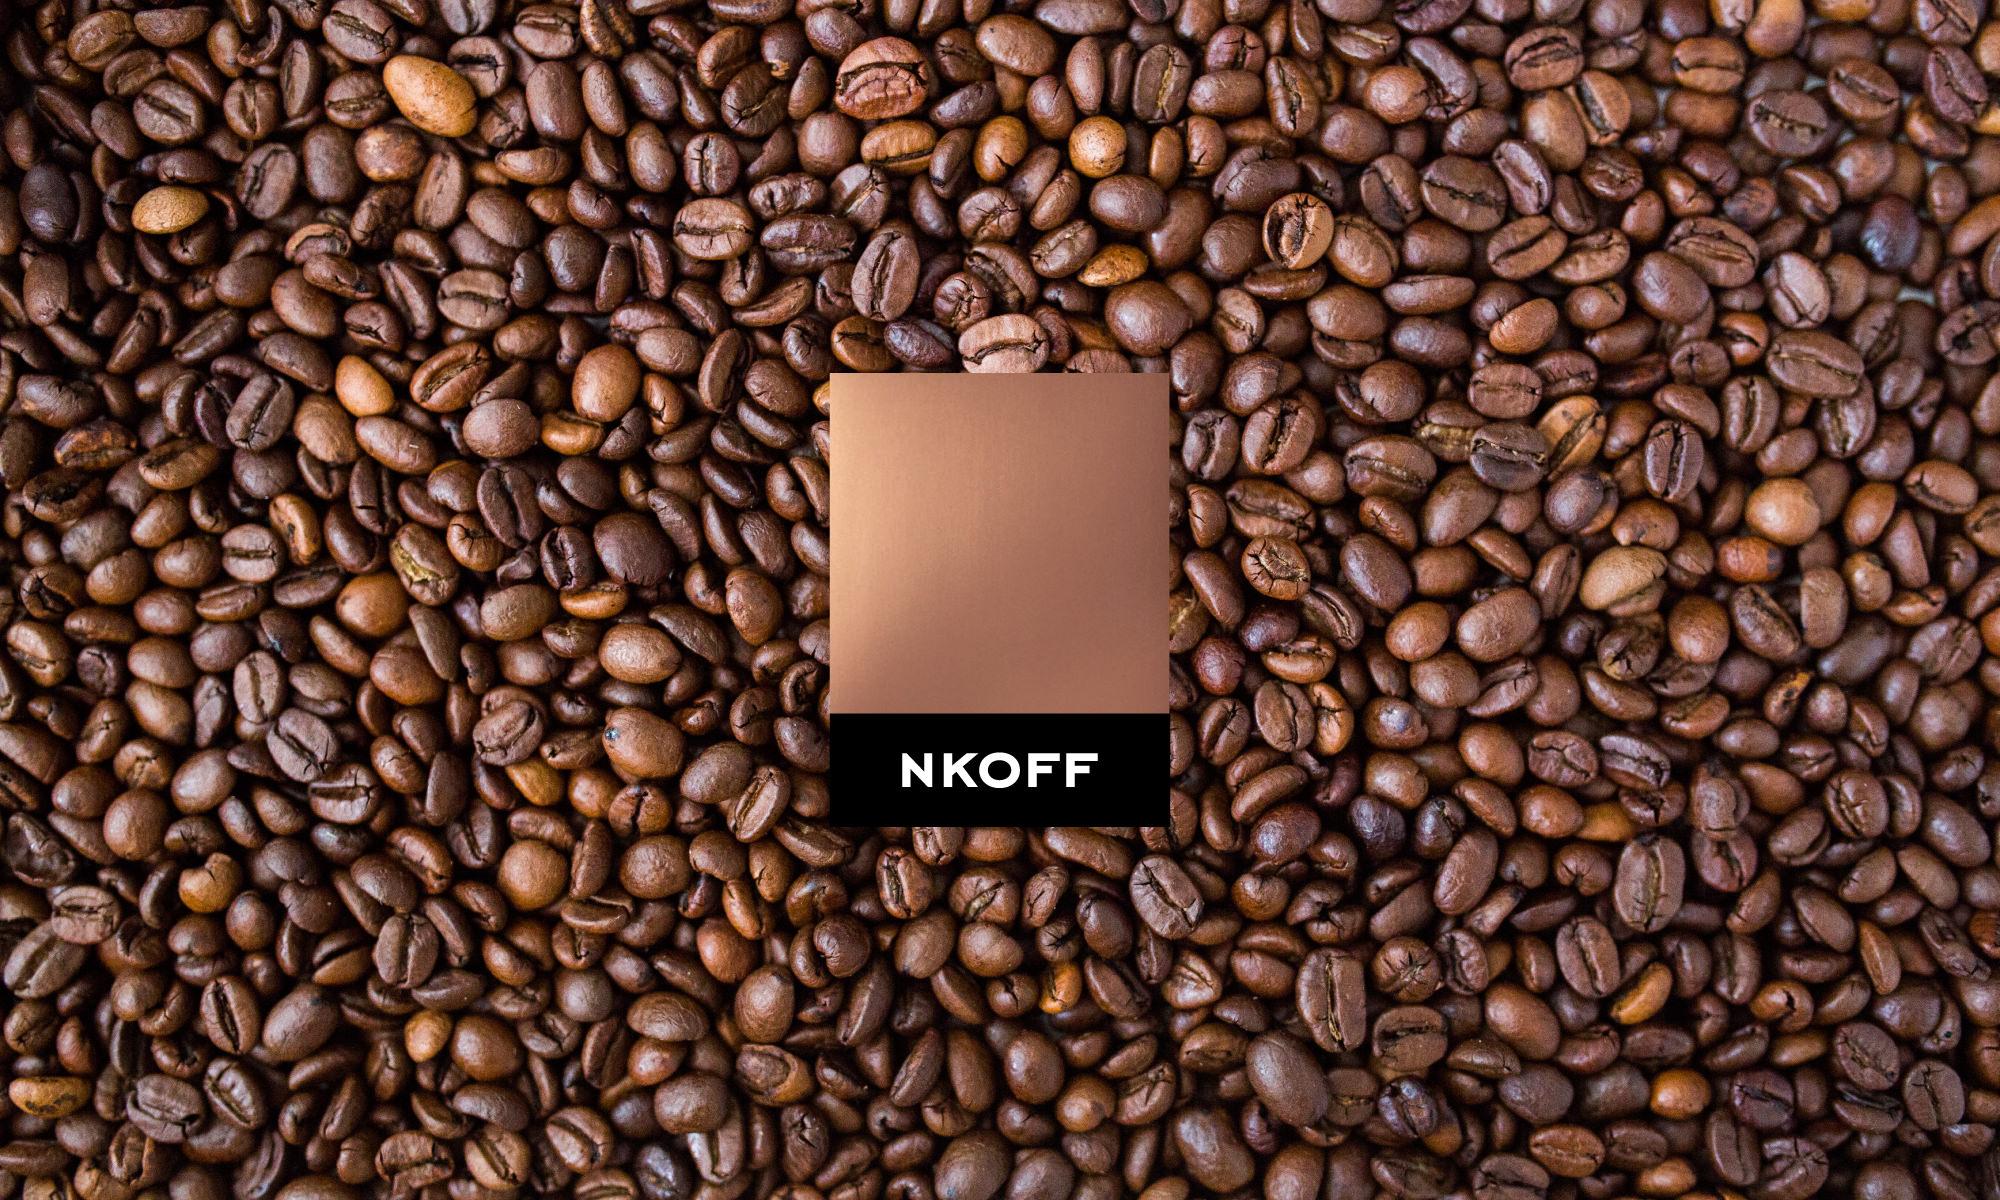 nkoff identity design